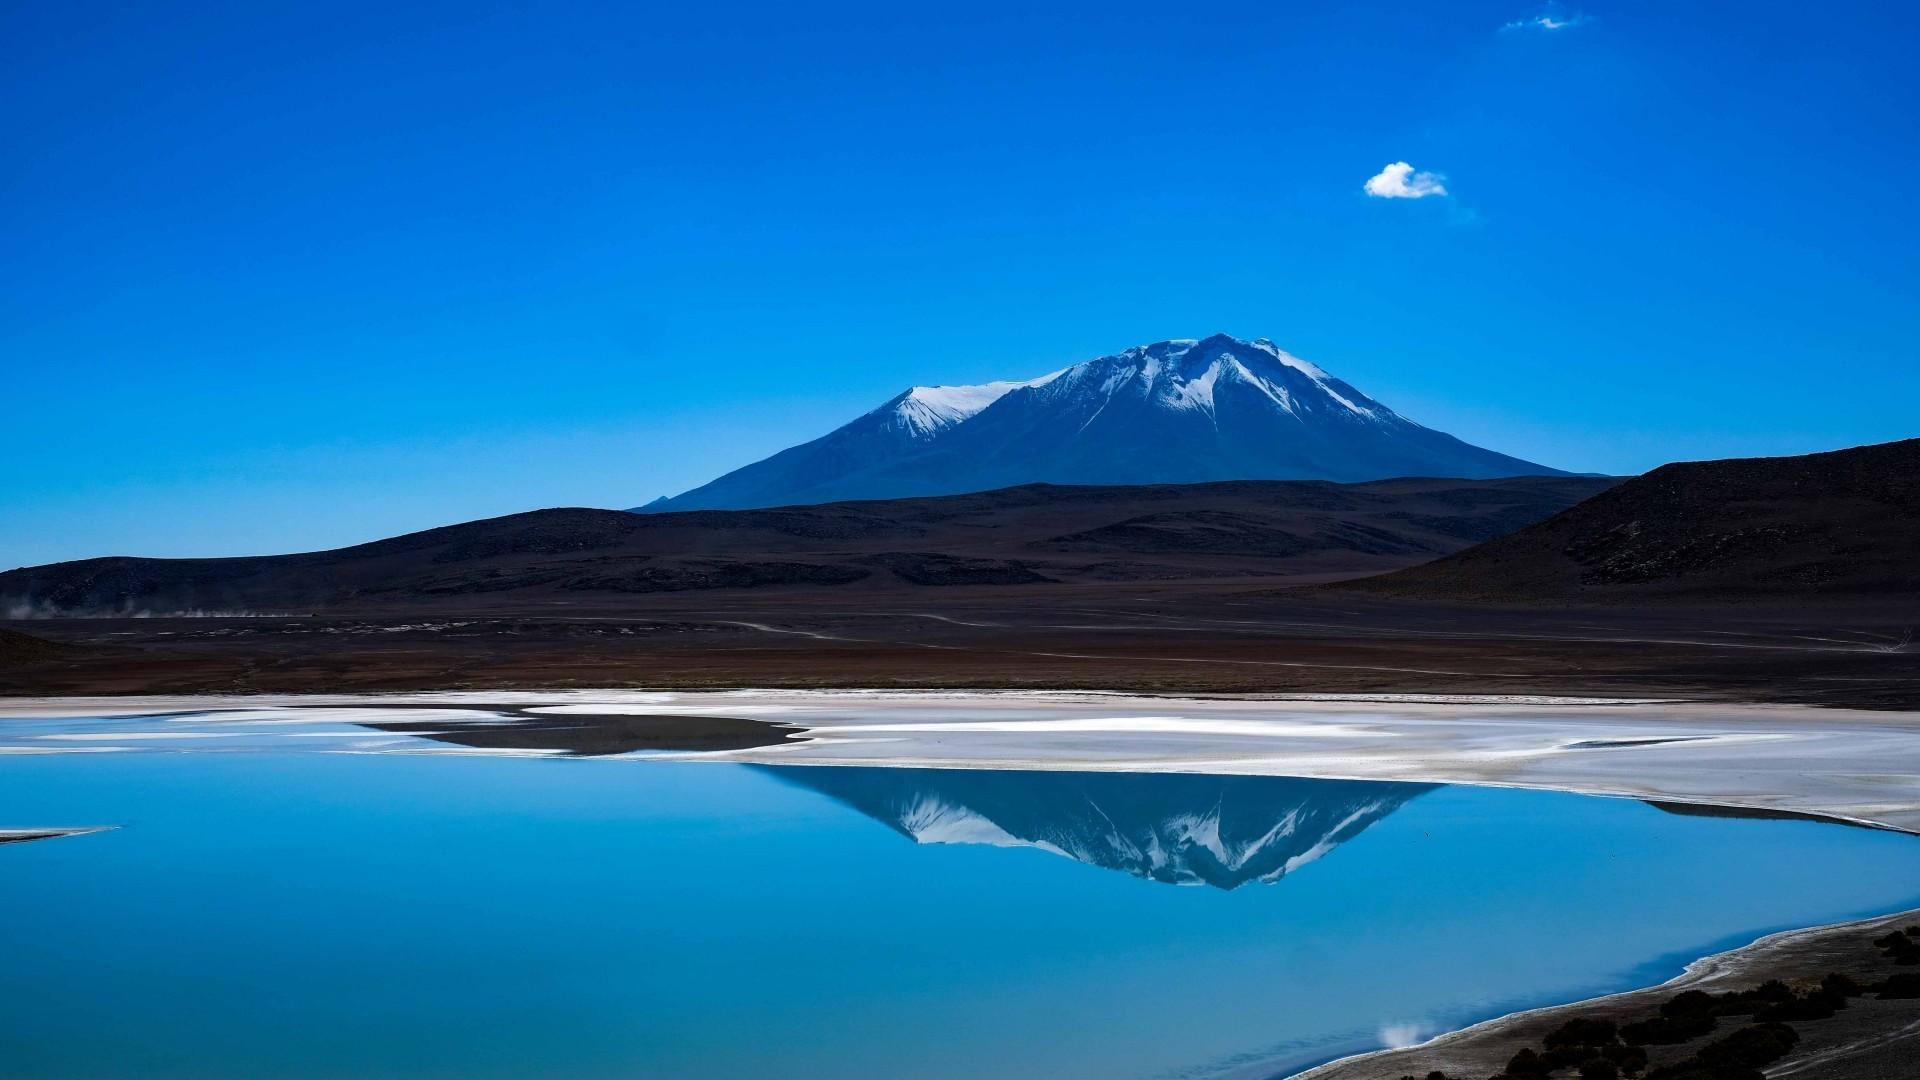 Res: 1920x1080, Mountain, Lake, Reflection, Snow, Glacier